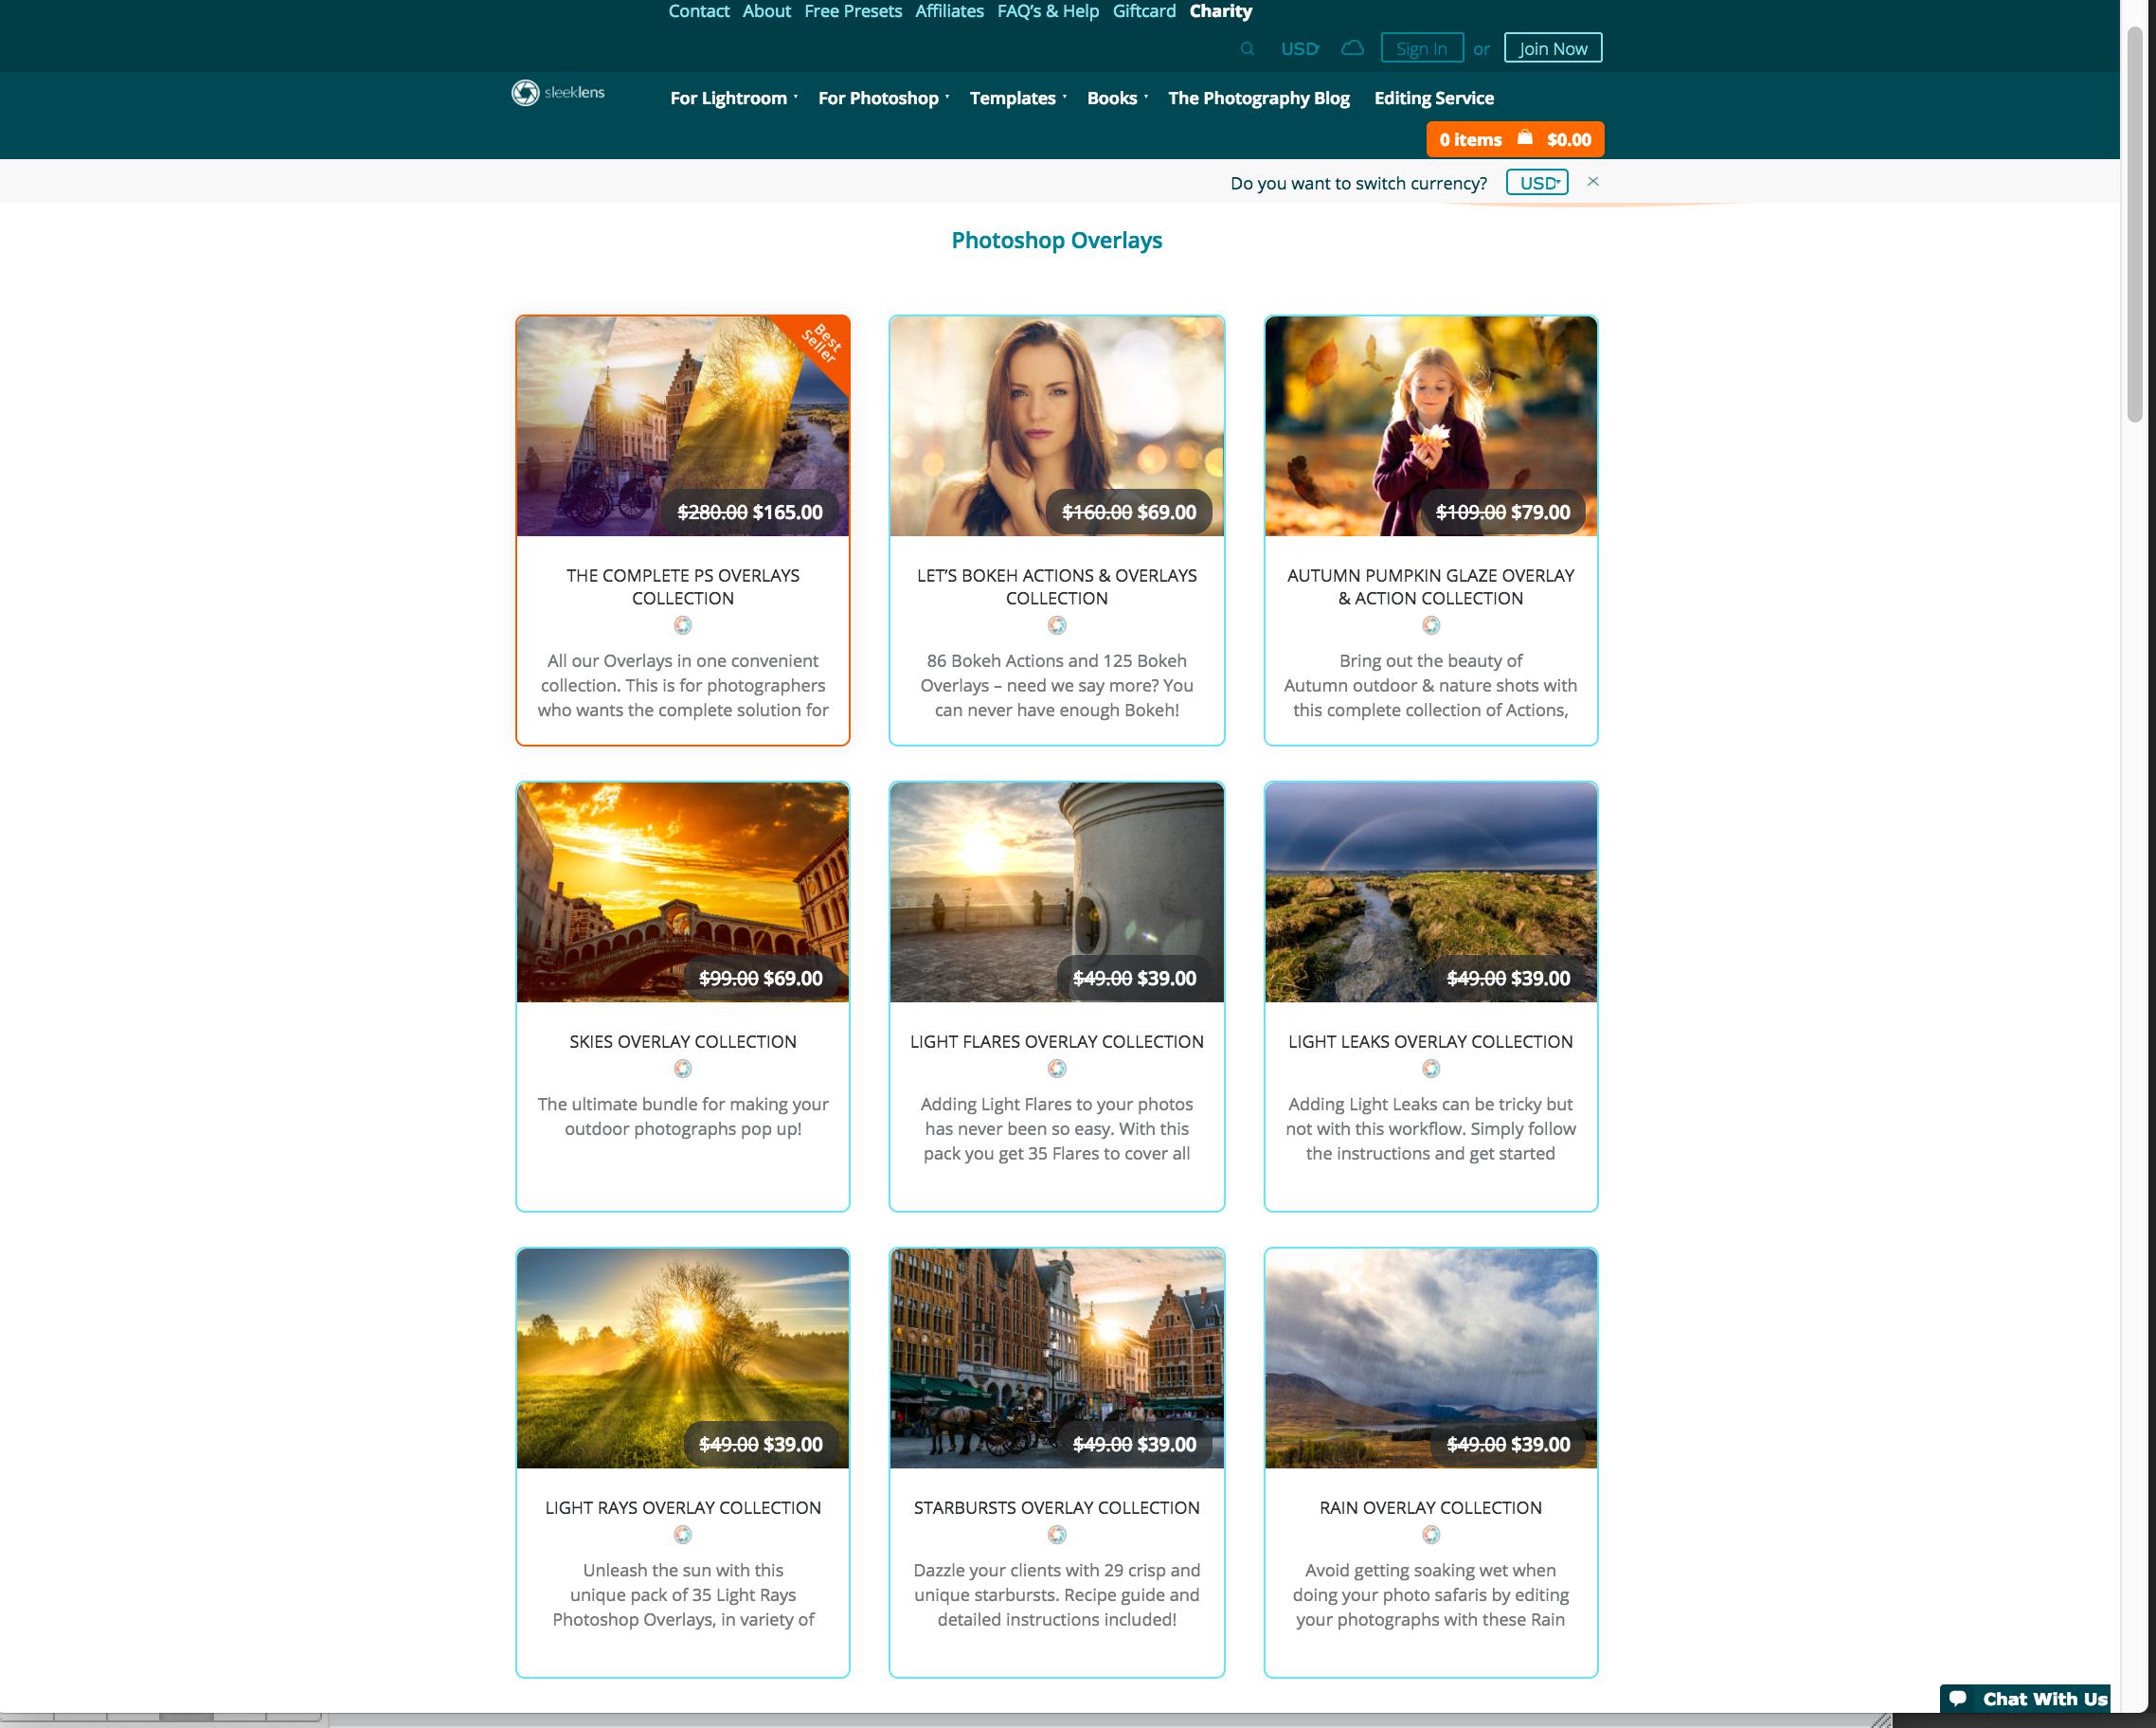 SleekLens.com Photoshop Overlays